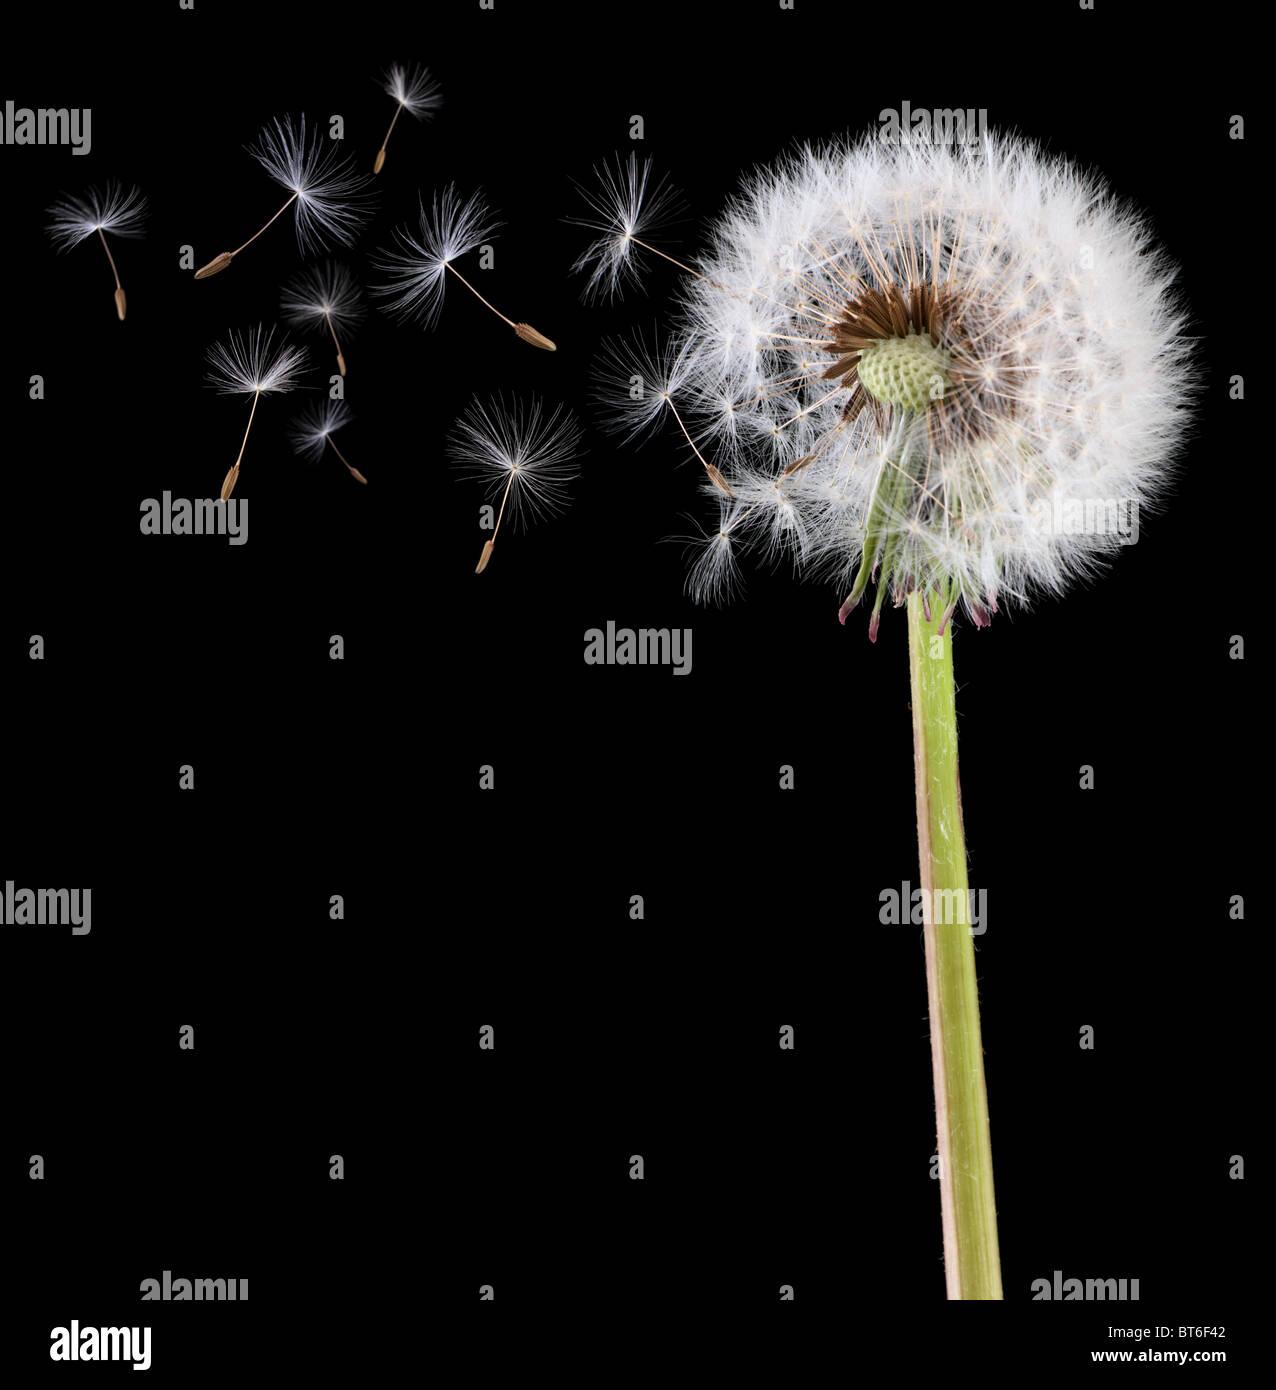 Dandelion seeds in the wind - Stock Image